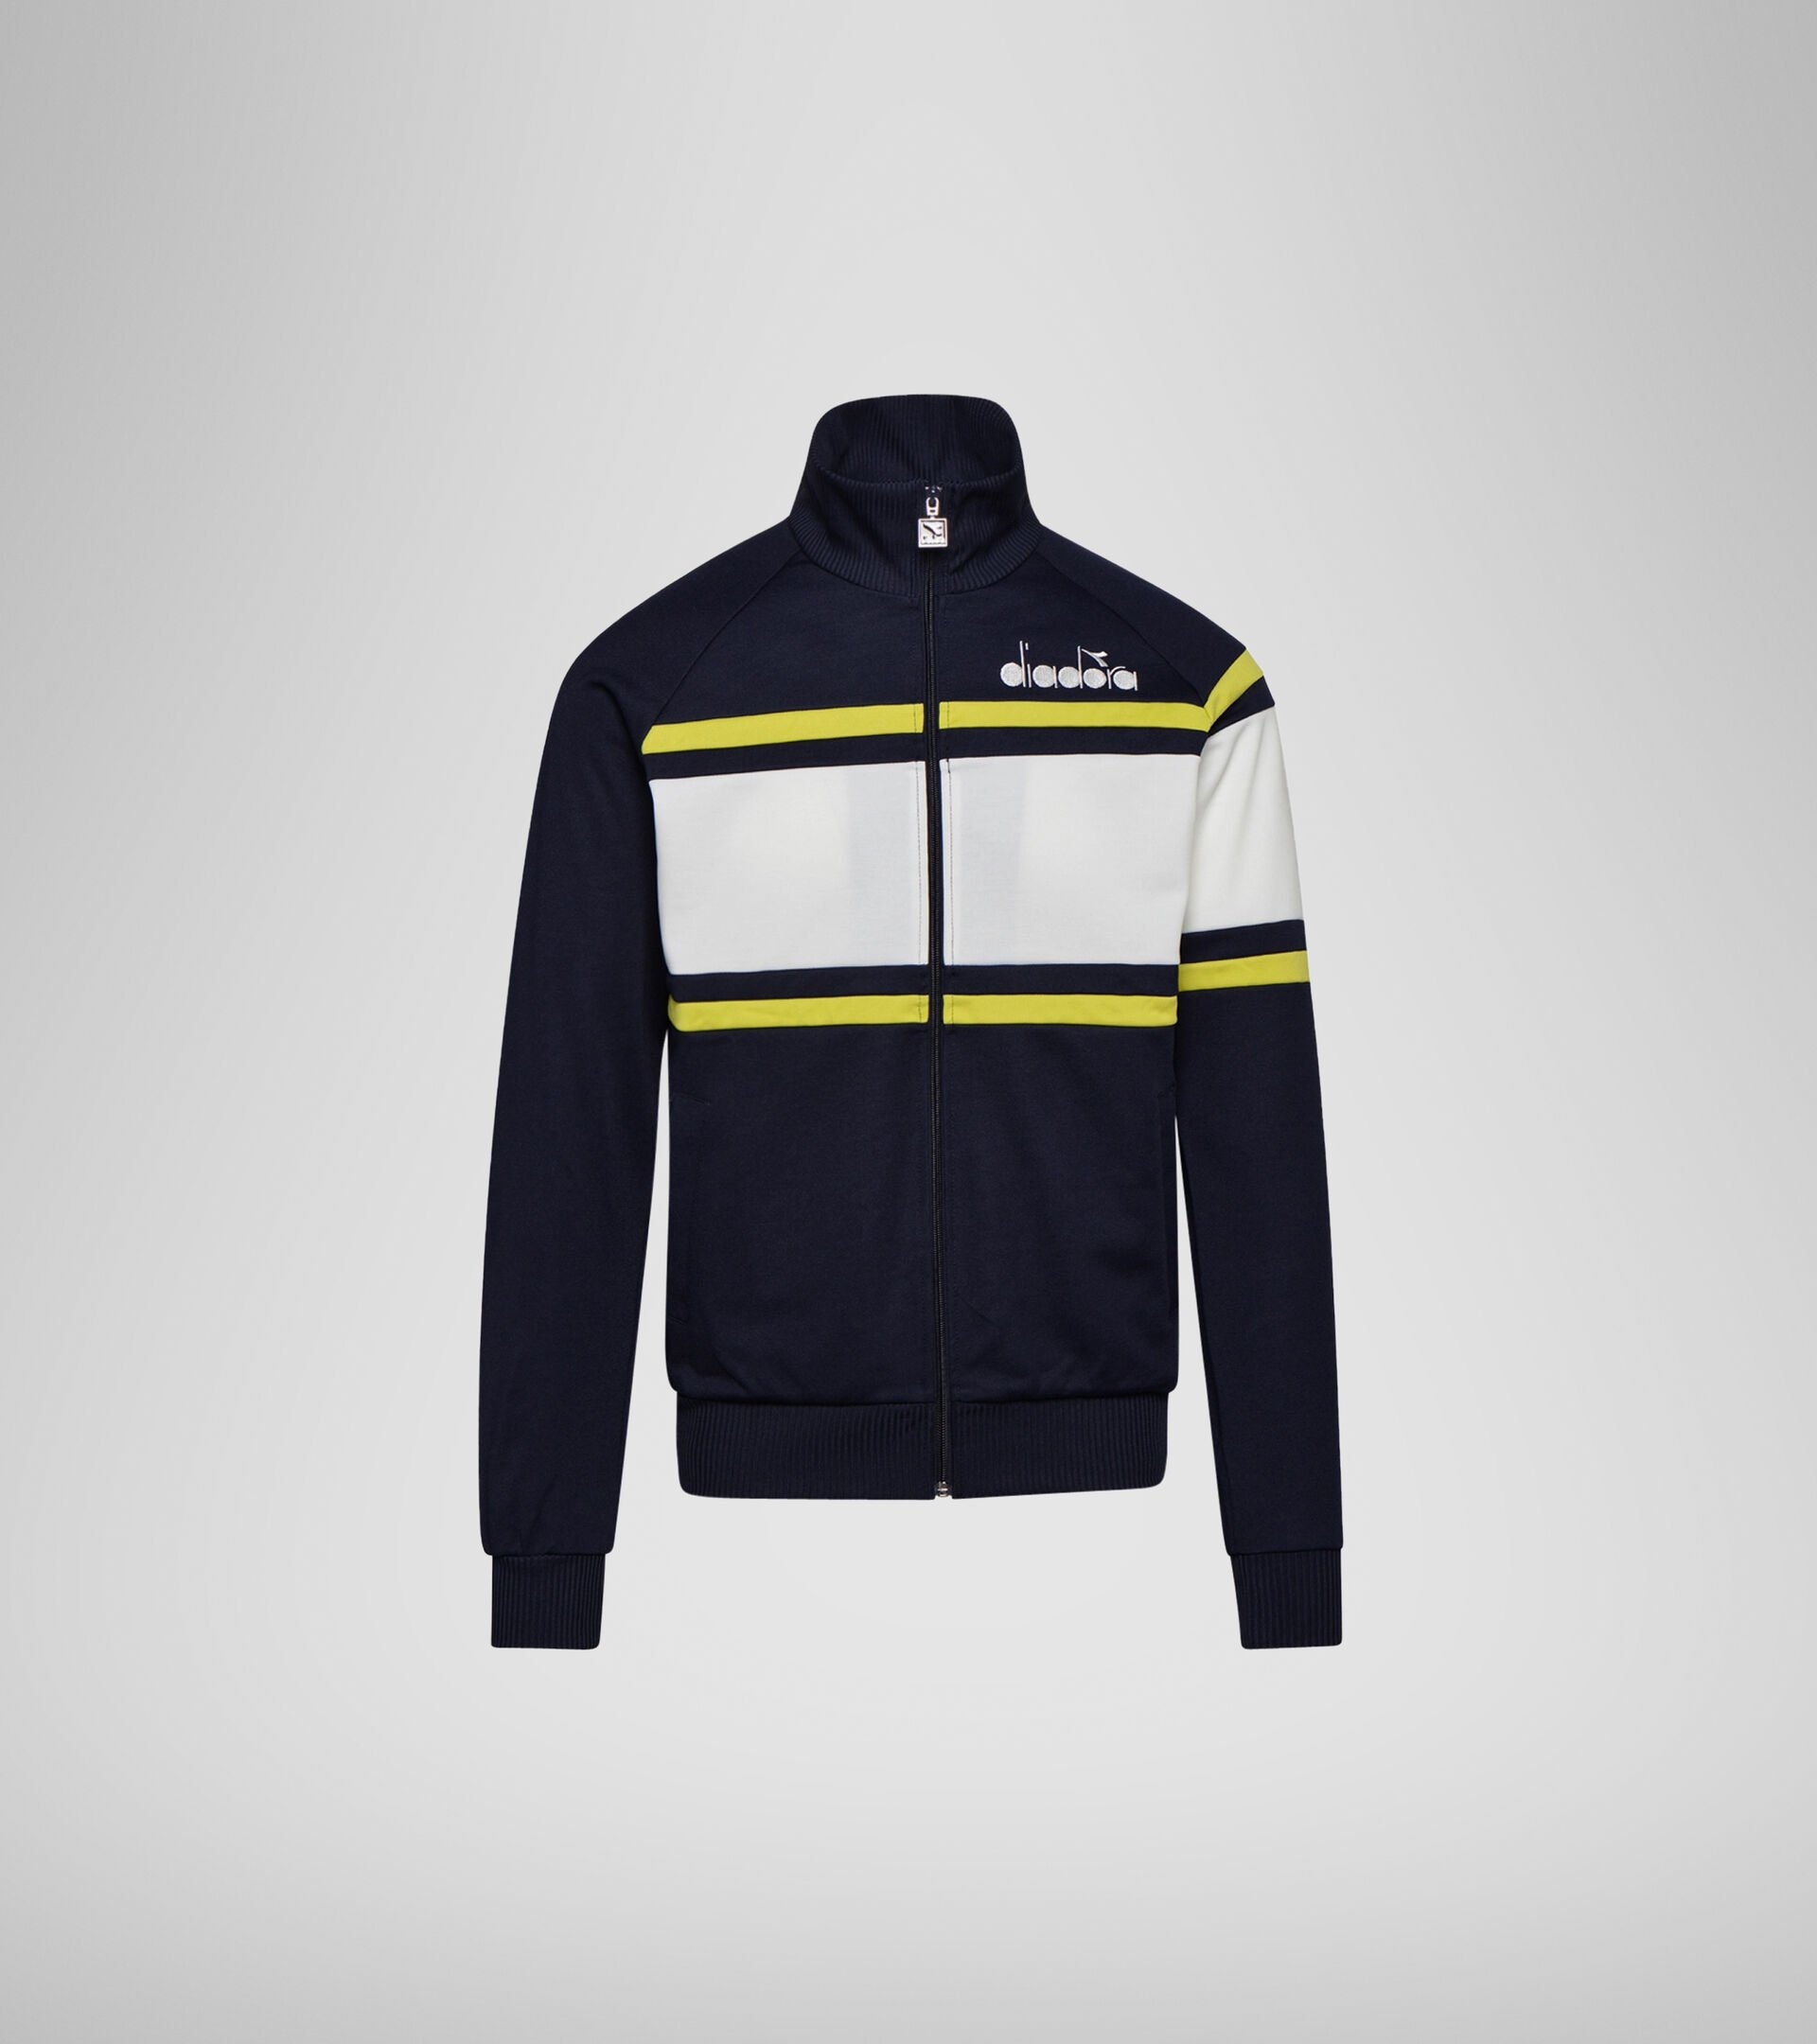 Sportswear-Jacke - Unisex JACKET 80S CABAN BLAU - Diadora